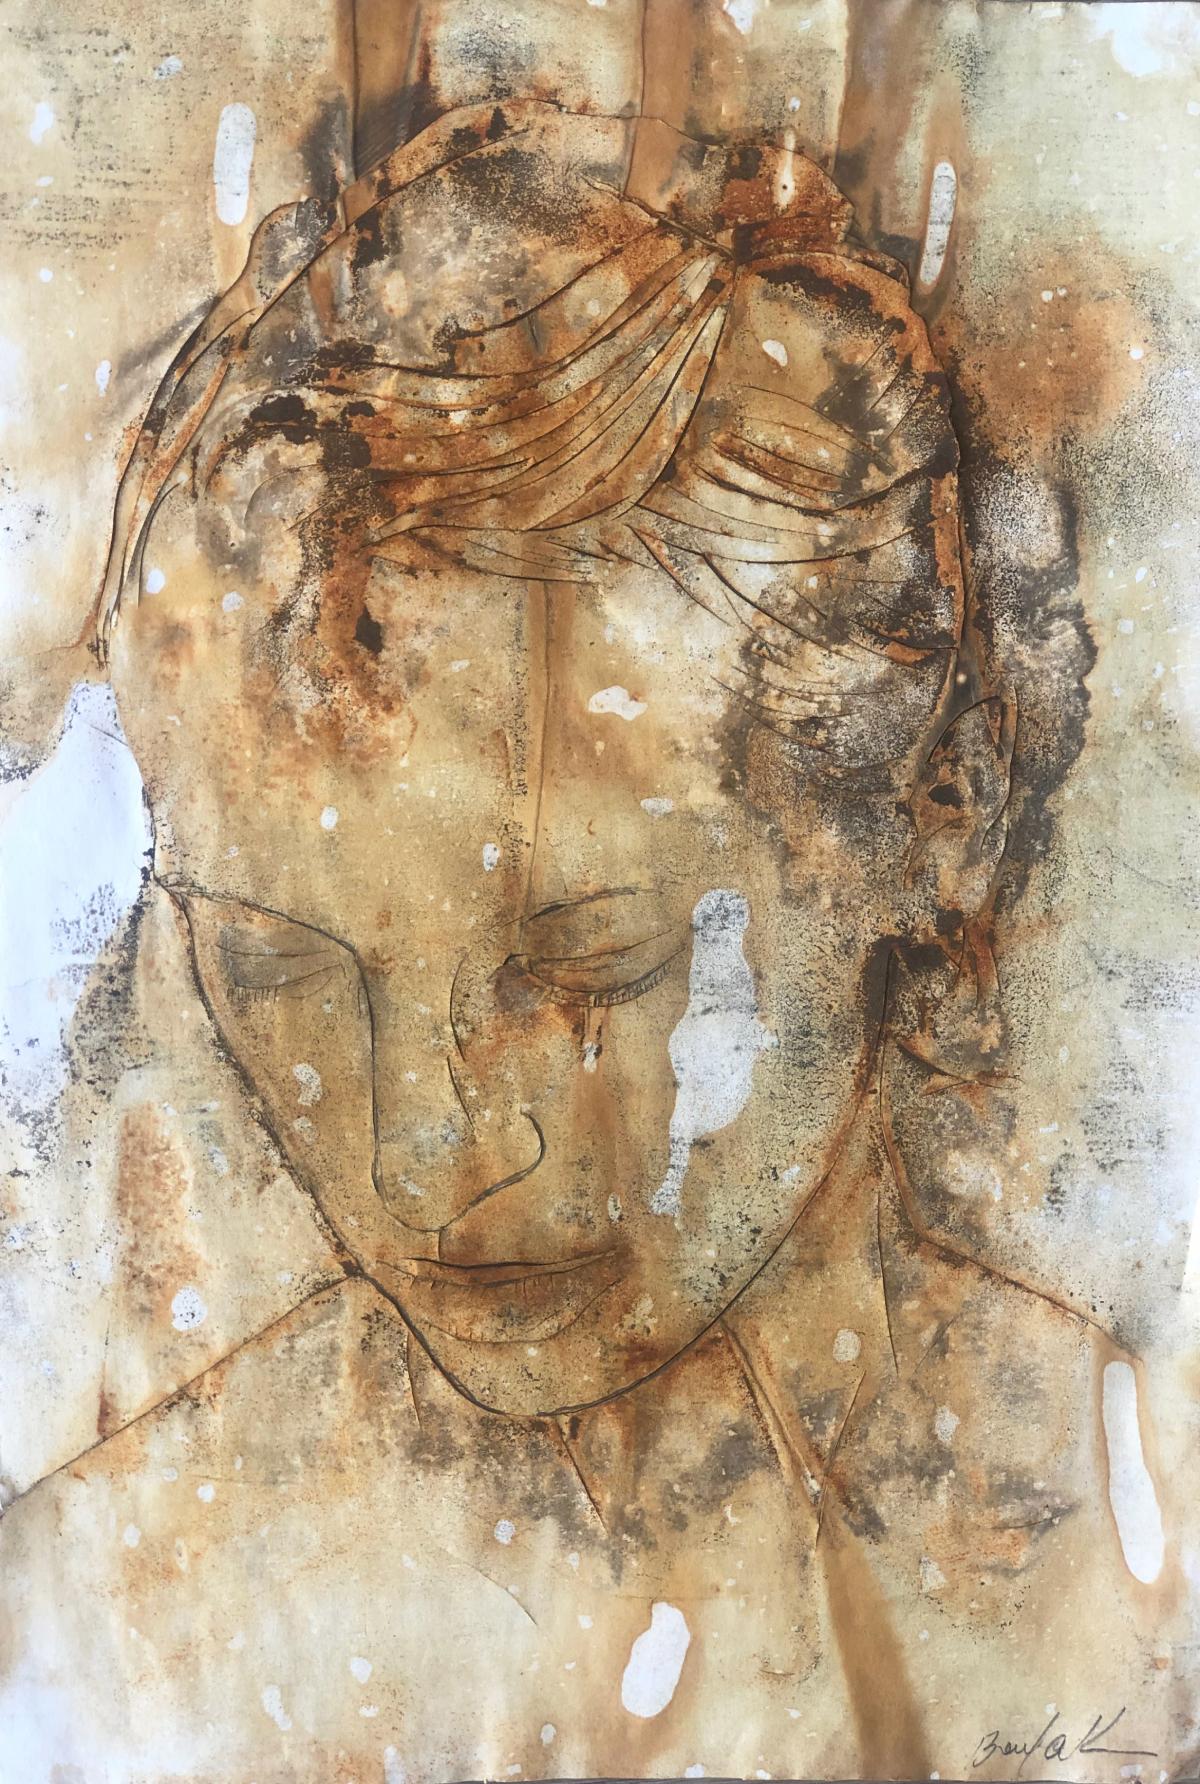 Osnat by Philippe Boulakia 29X20 cm